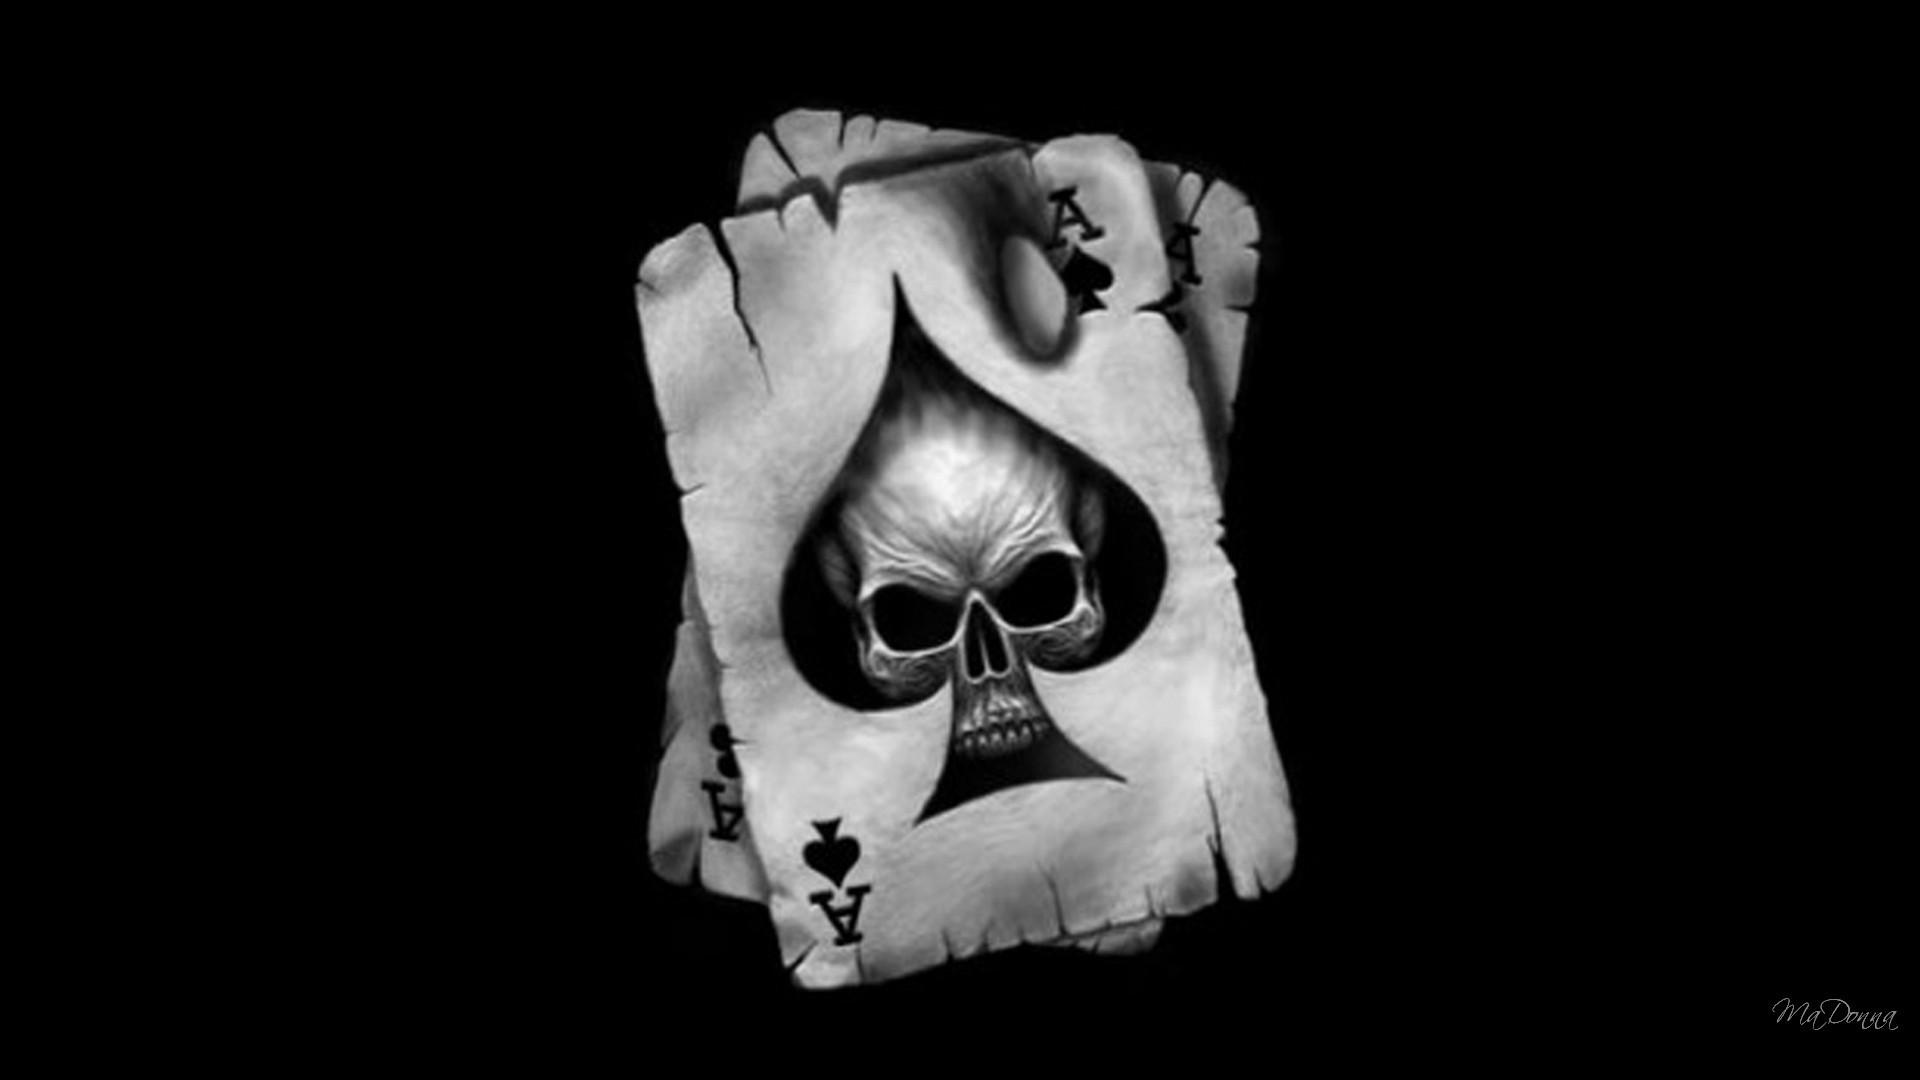 Download Ace Of Skulls Wallpaper | Full HD Wallpapers